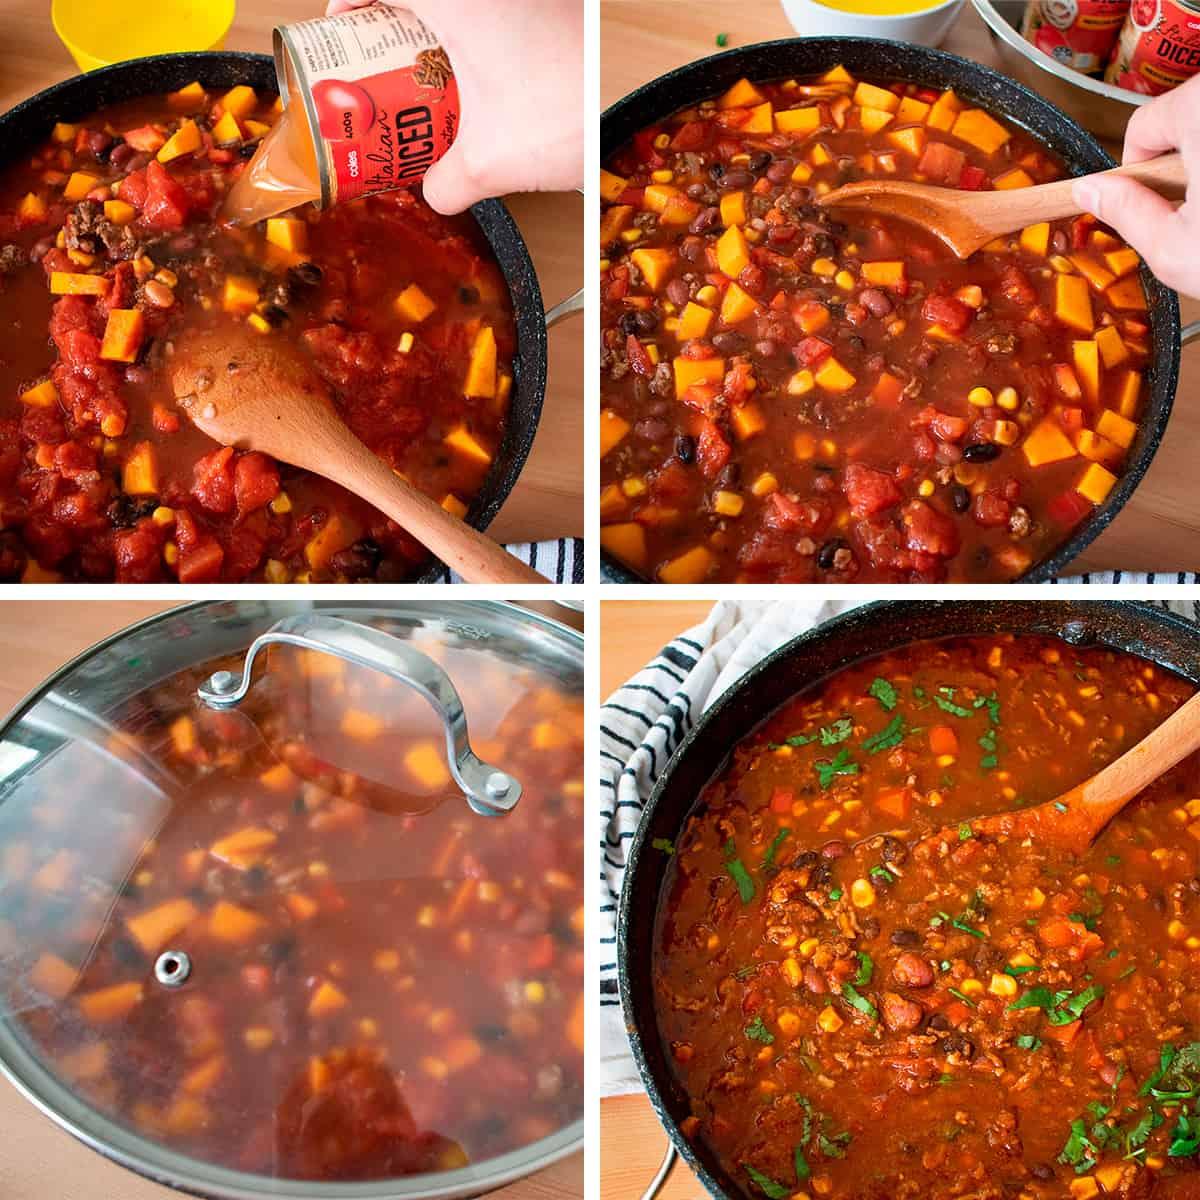 proceso paso a paso para preparar chili con carne y frijoles